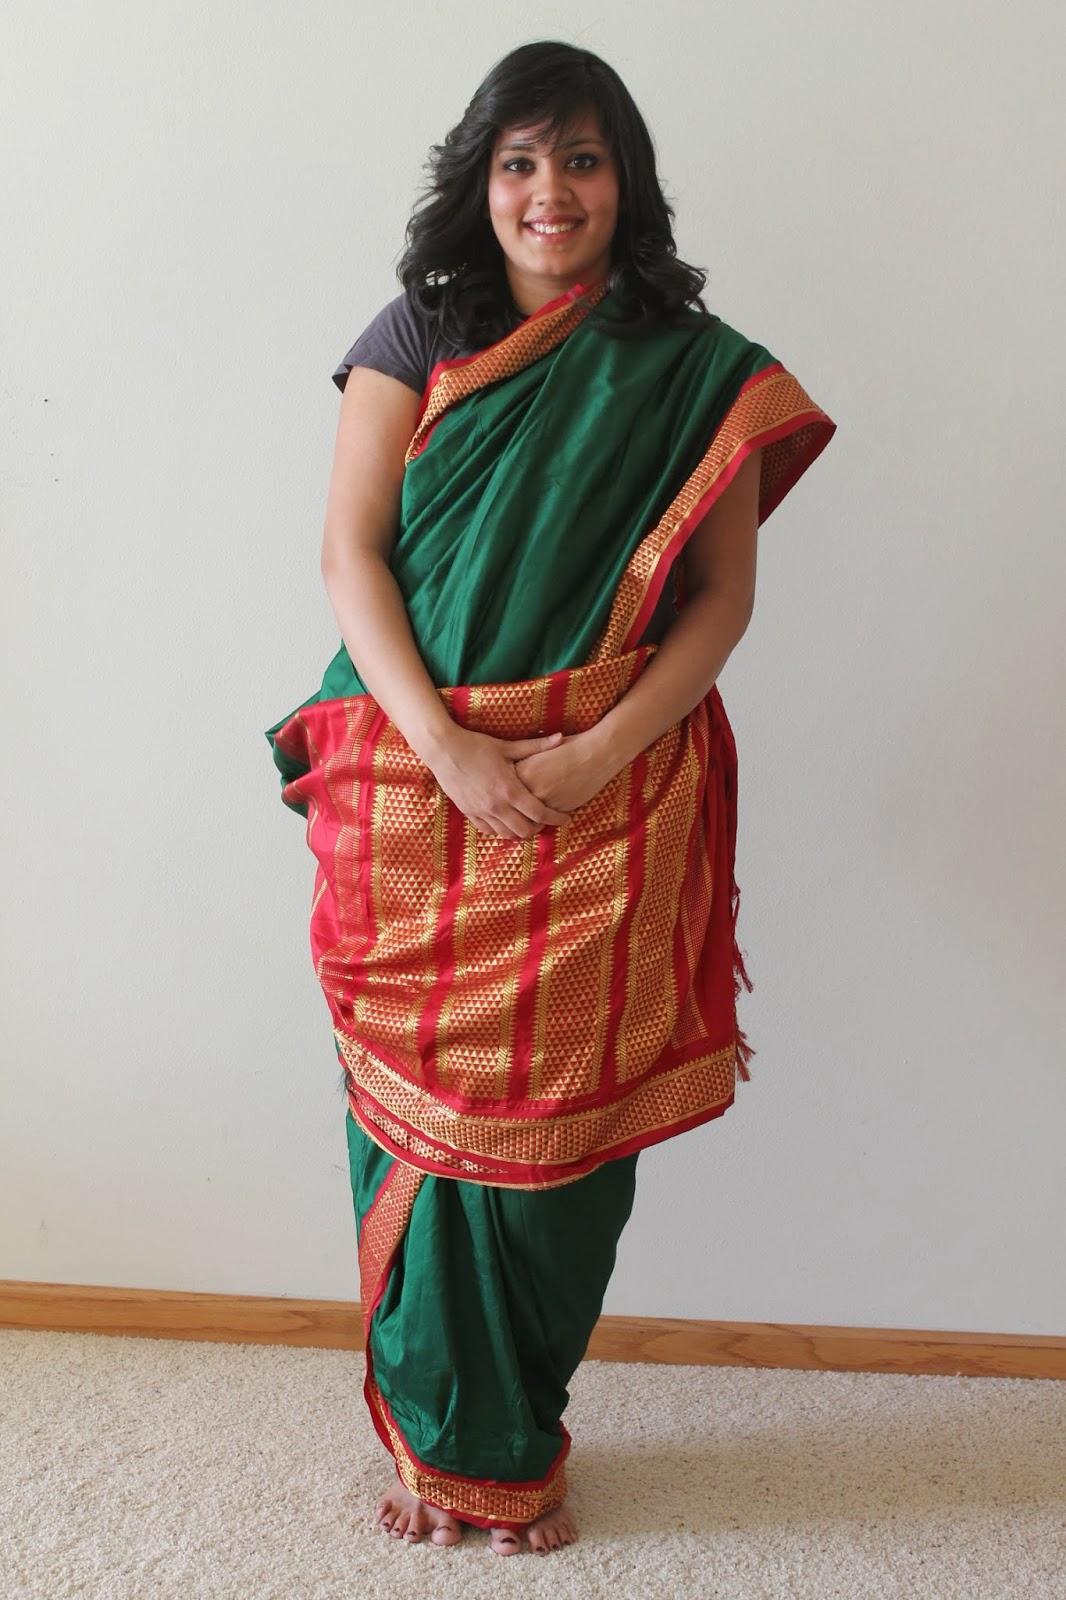 2019 year look- How to iyengar wear madisar saree